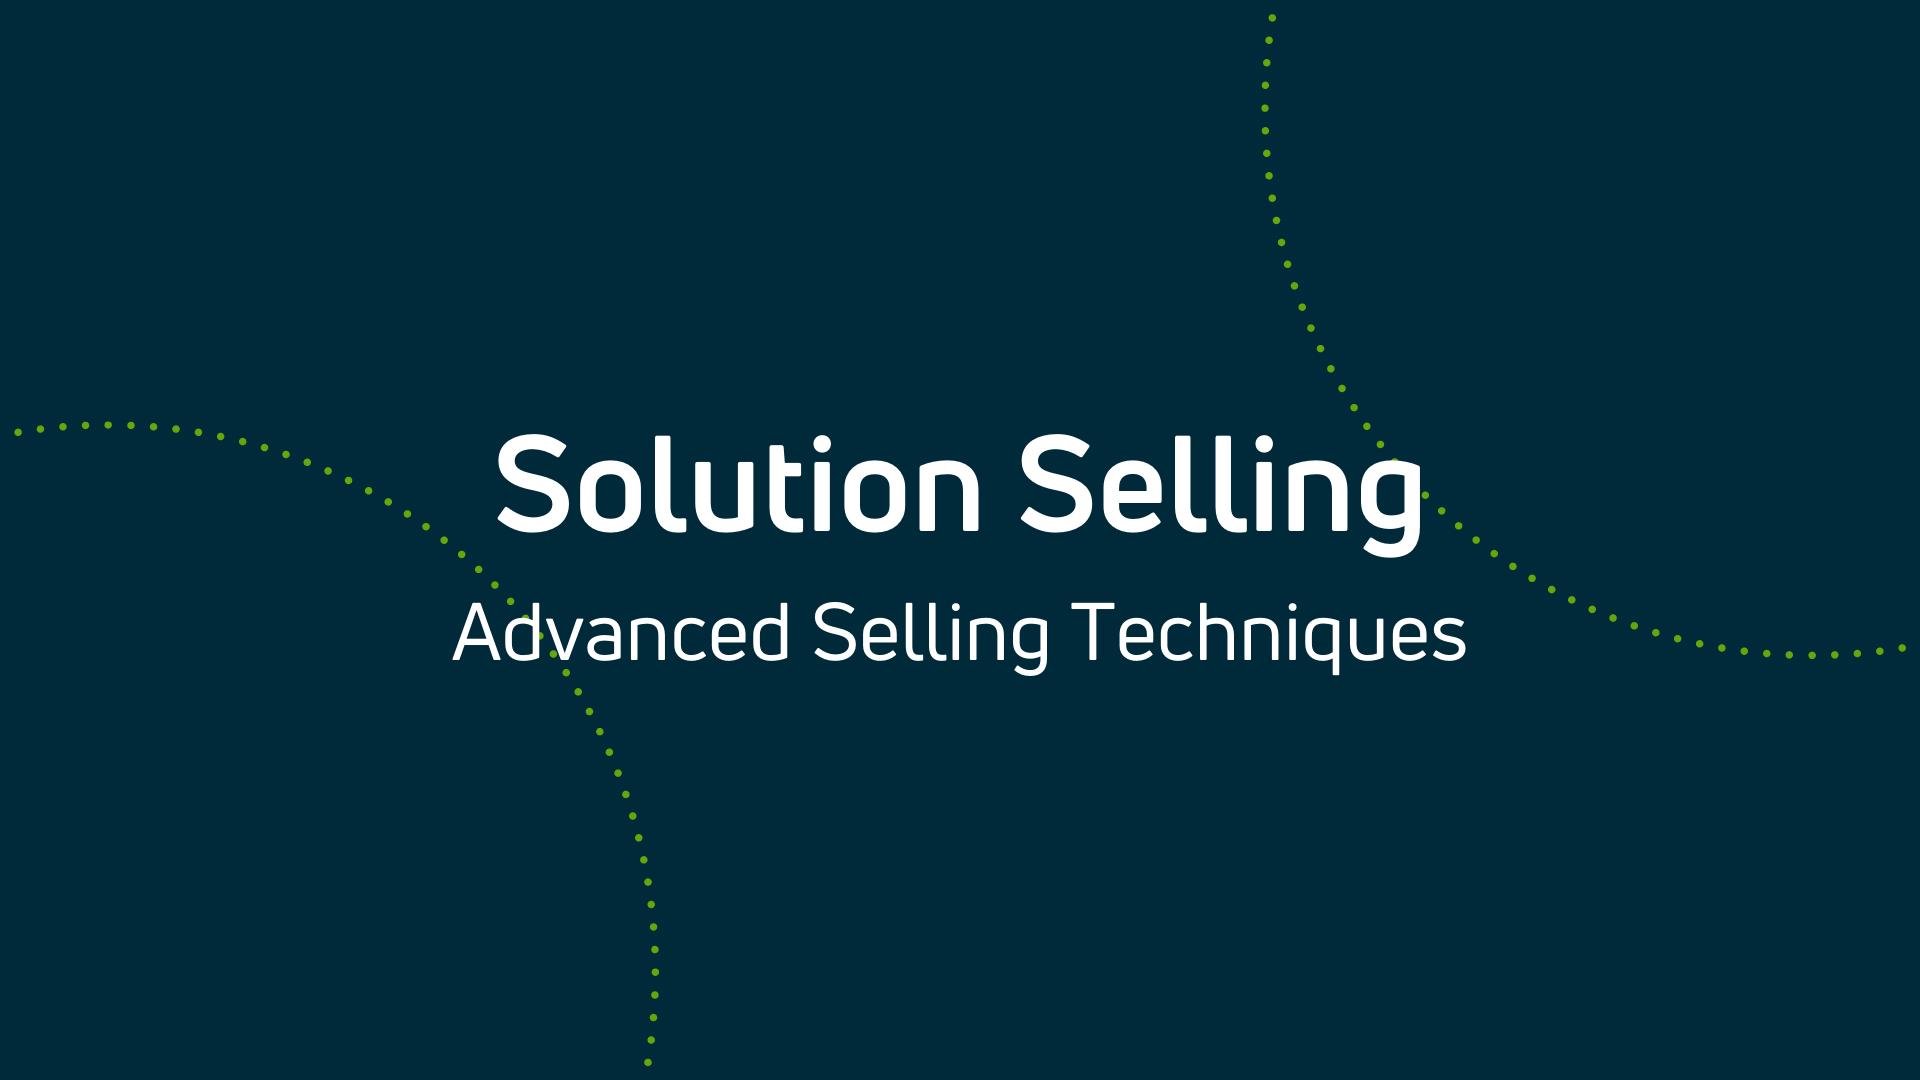 advancedsales.png